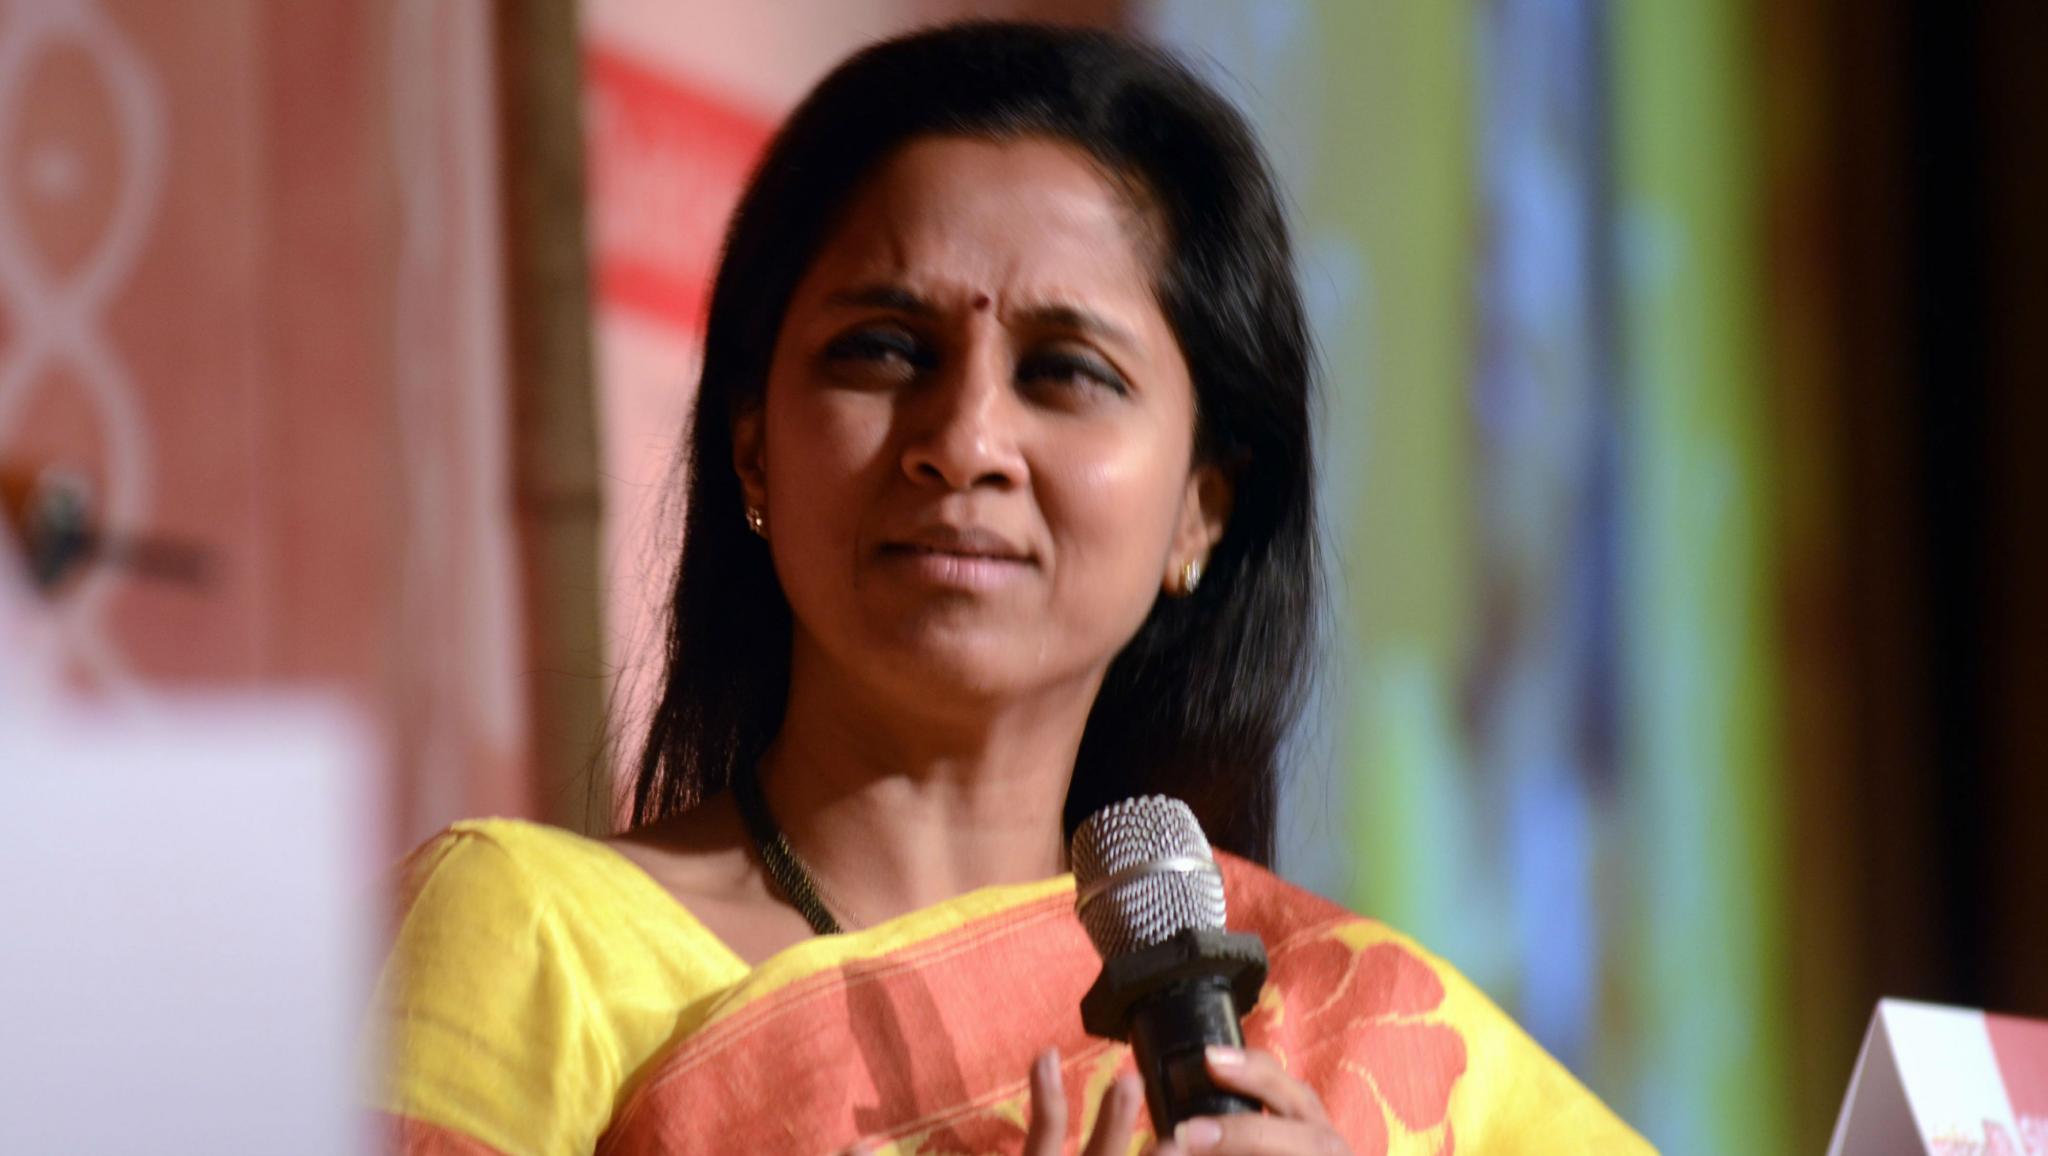 Republic Day 2020: After West Bengal, Maharashtra's Tableau for Parade Rejected; NCP's Supriya Sule Calls Centre 'Prejudiced'